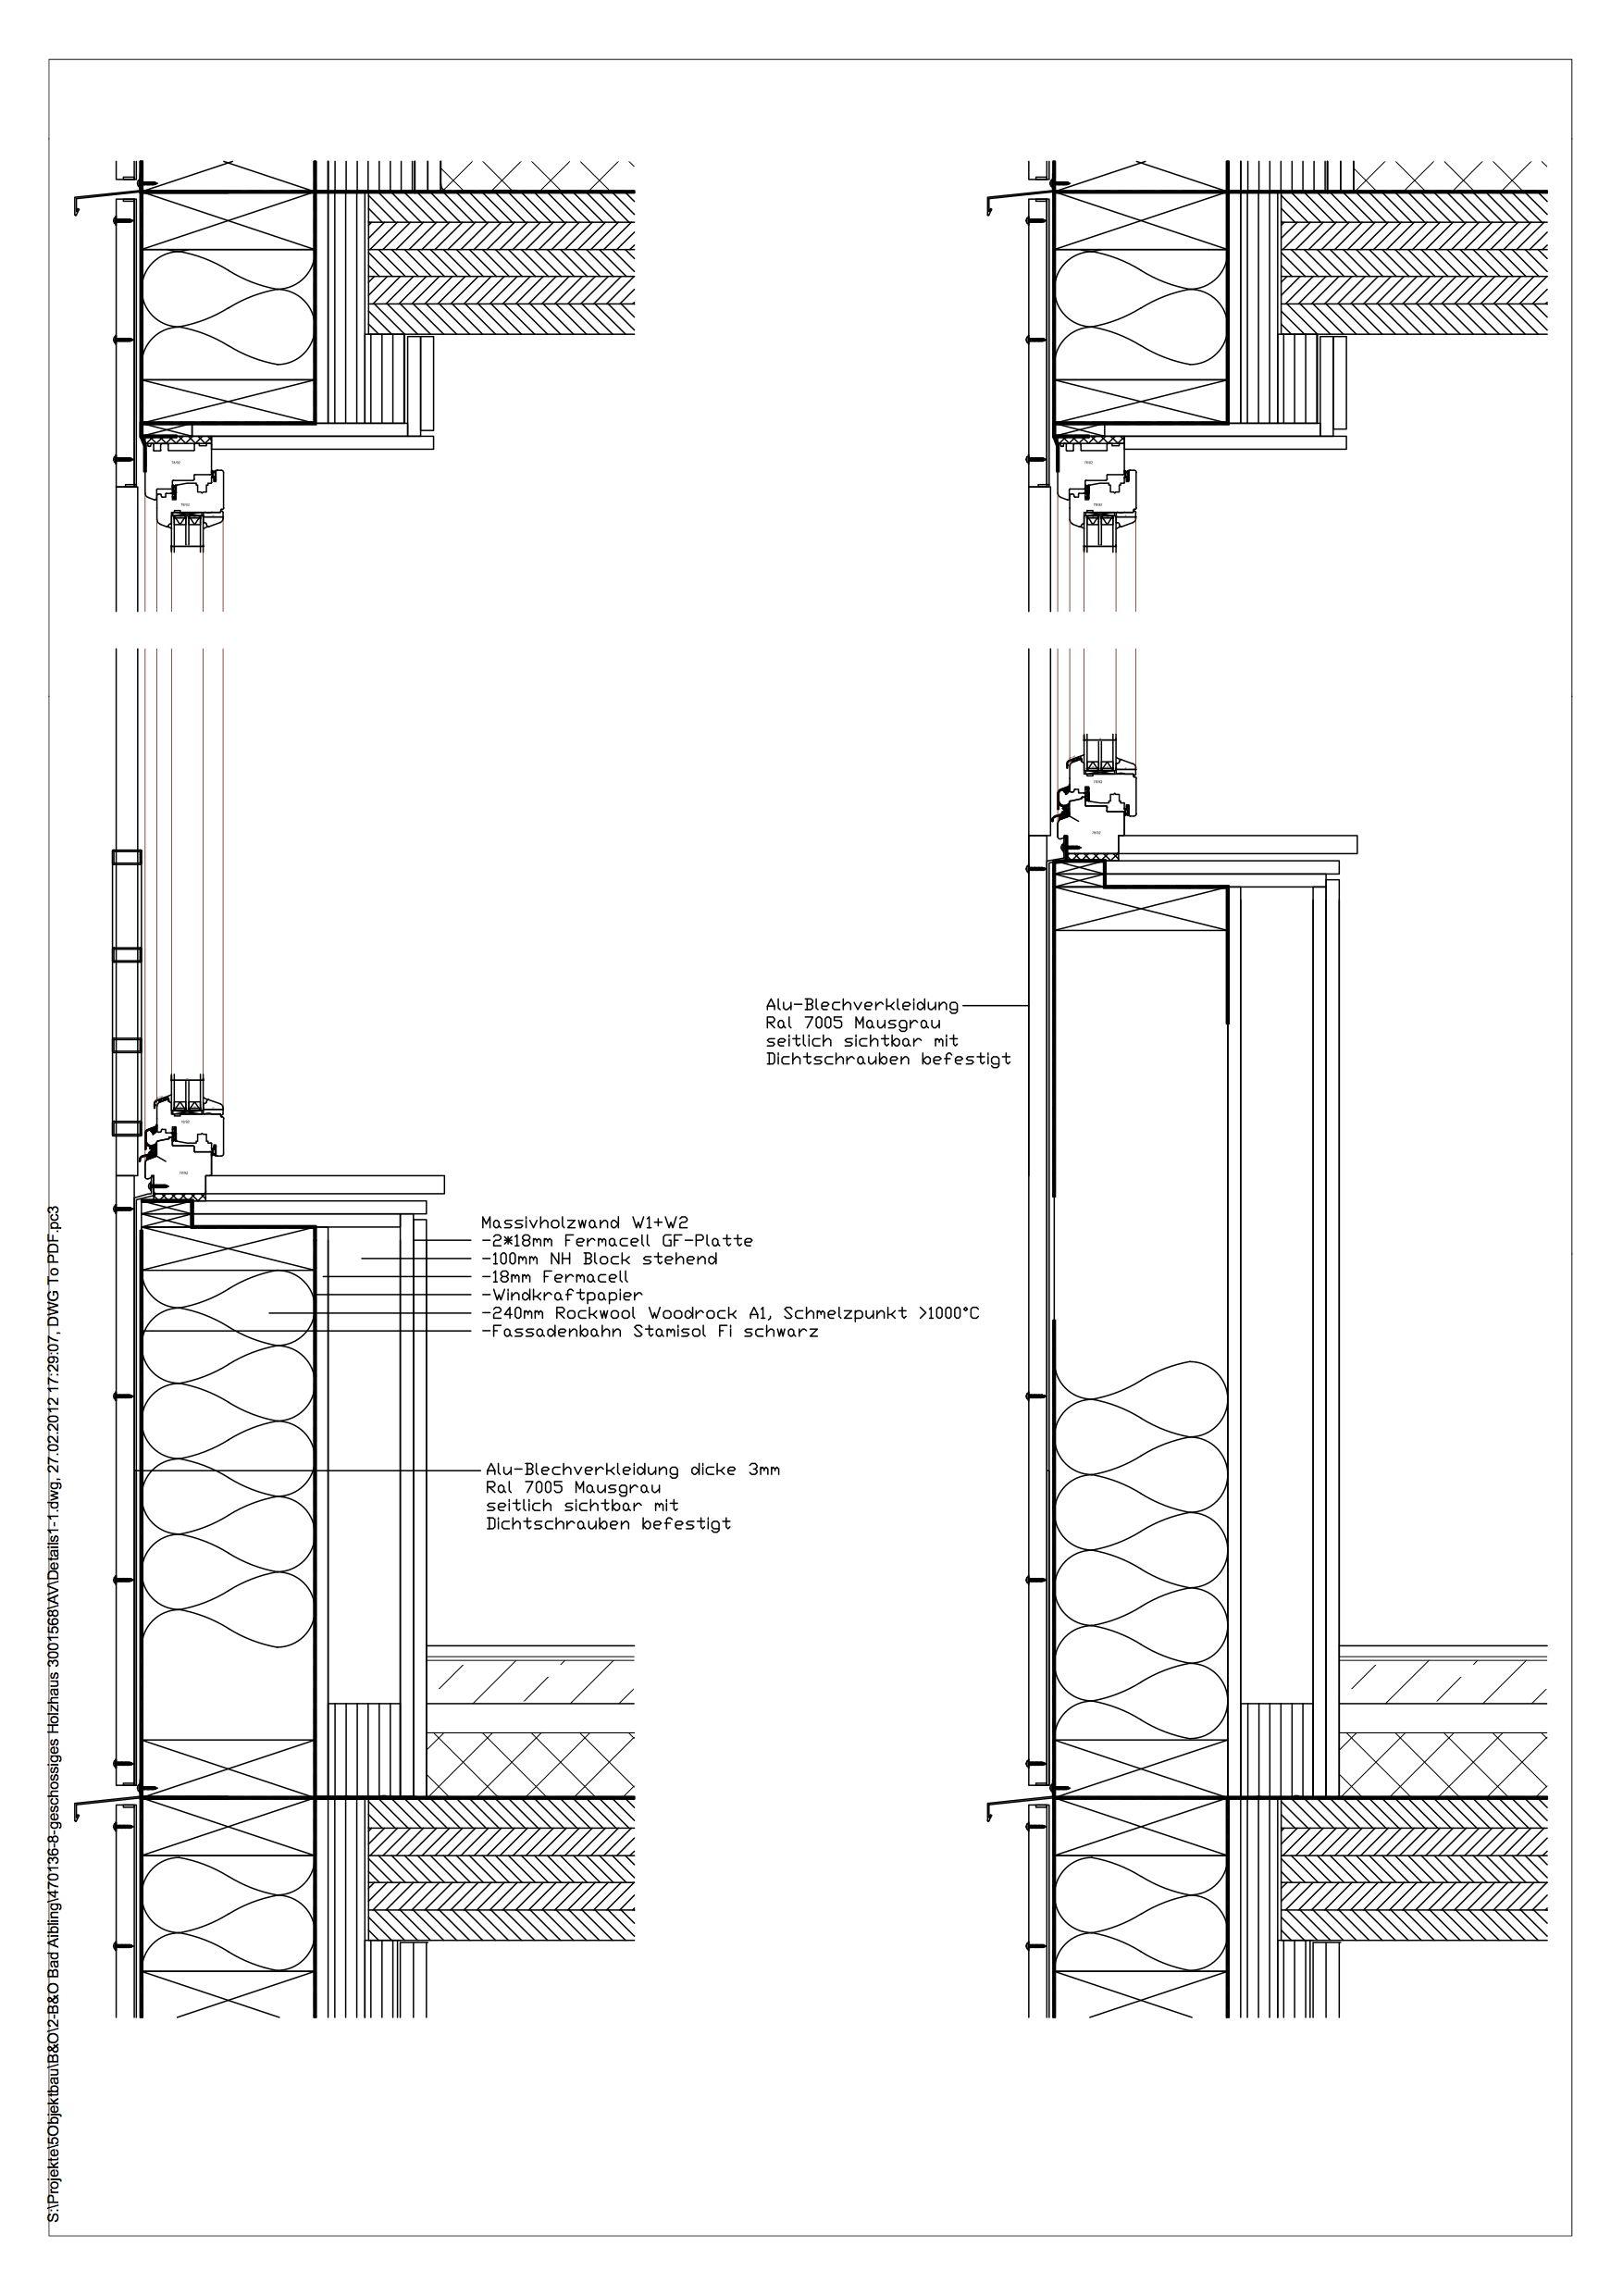 Brandschutz Im Holzbau Dabonline Deutsches Architektenblatt Holzbau Architekt Holzrahmenbau